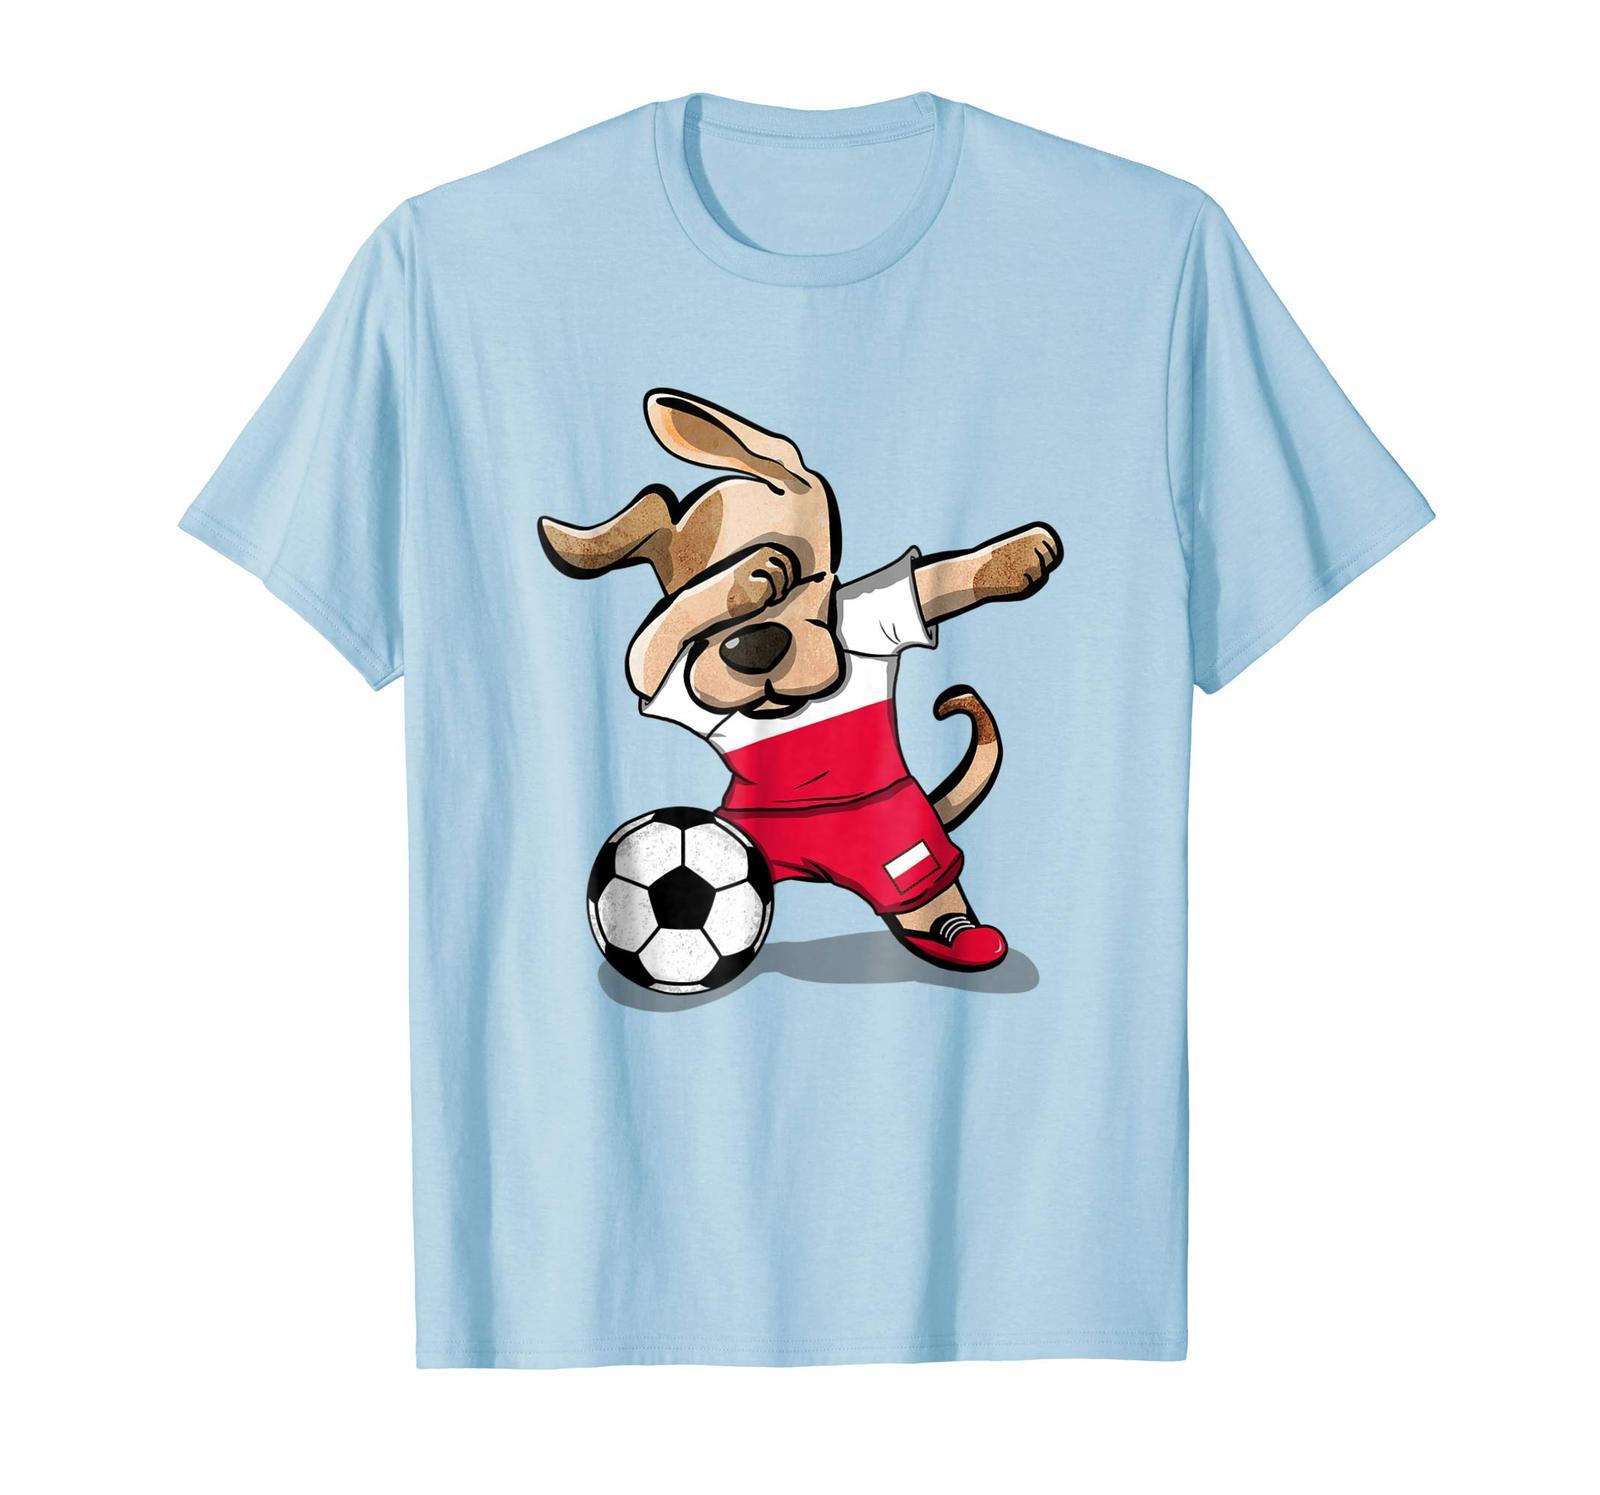 New Shirts - Dog Dabbing Soccer Poland Jersey Shirt 2018 Polish Football Men - $19.95 - $23.95